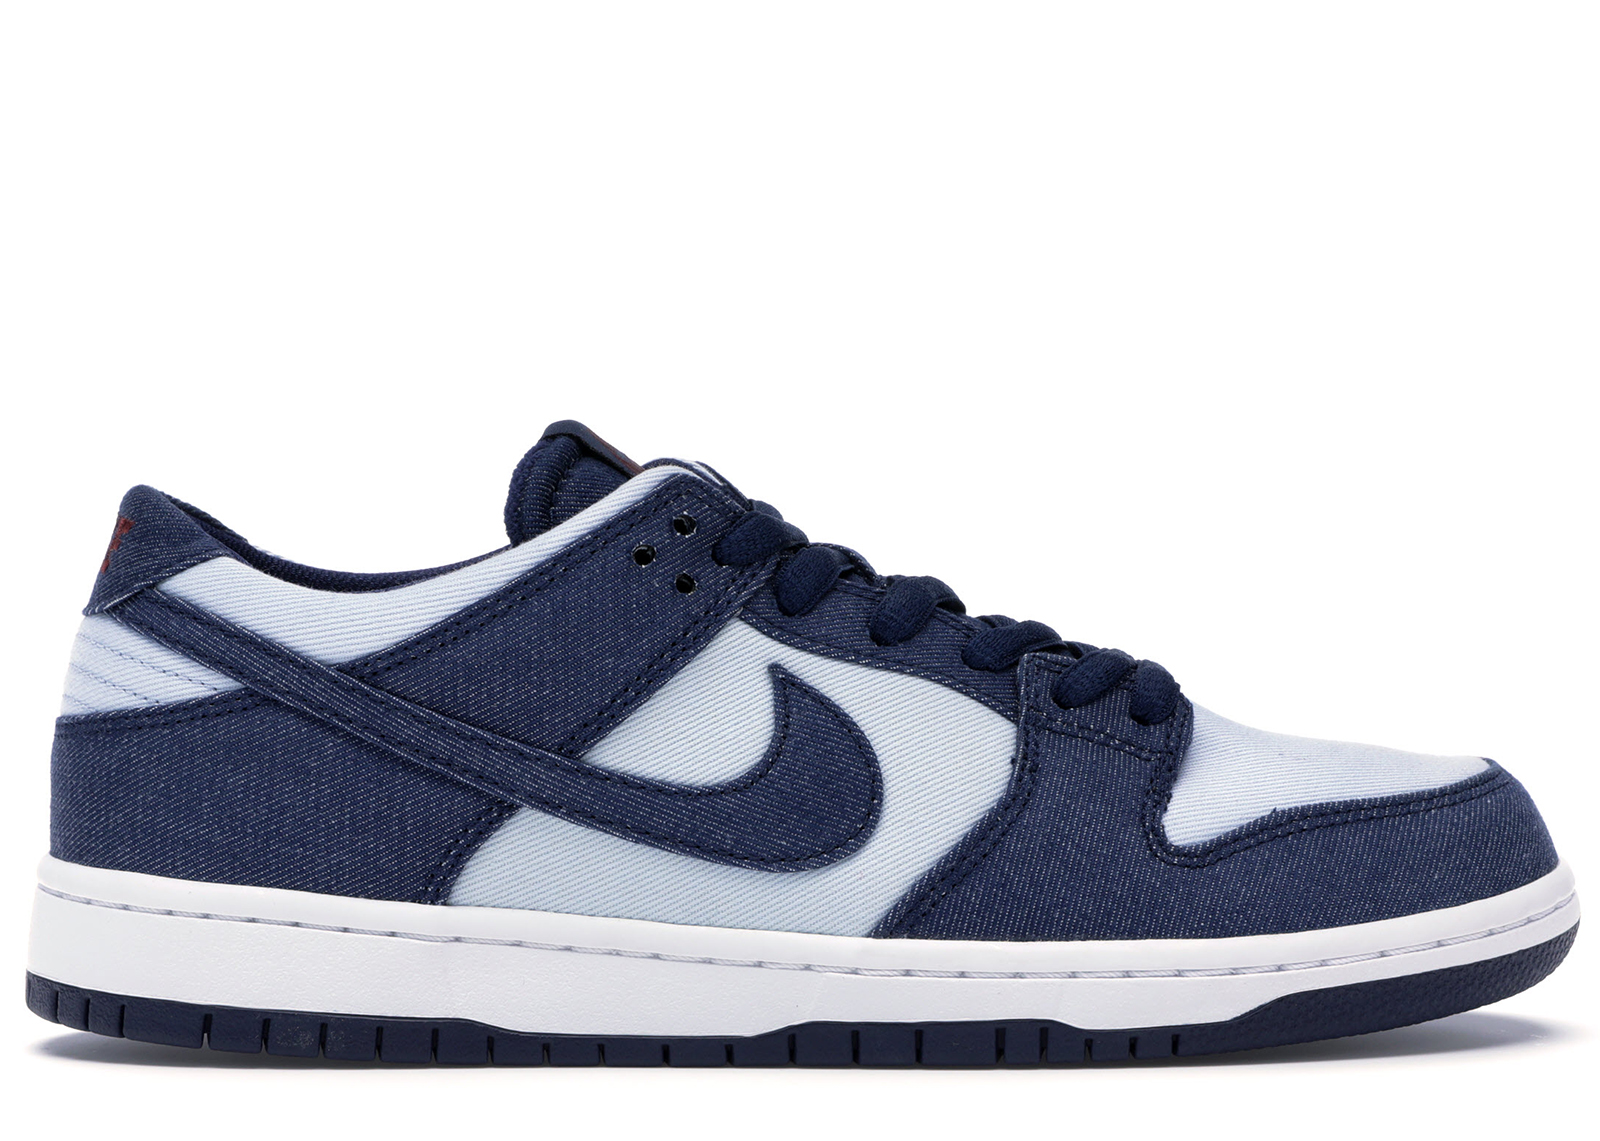 Nike SB Dunk Low Binary Blue - 854866-444